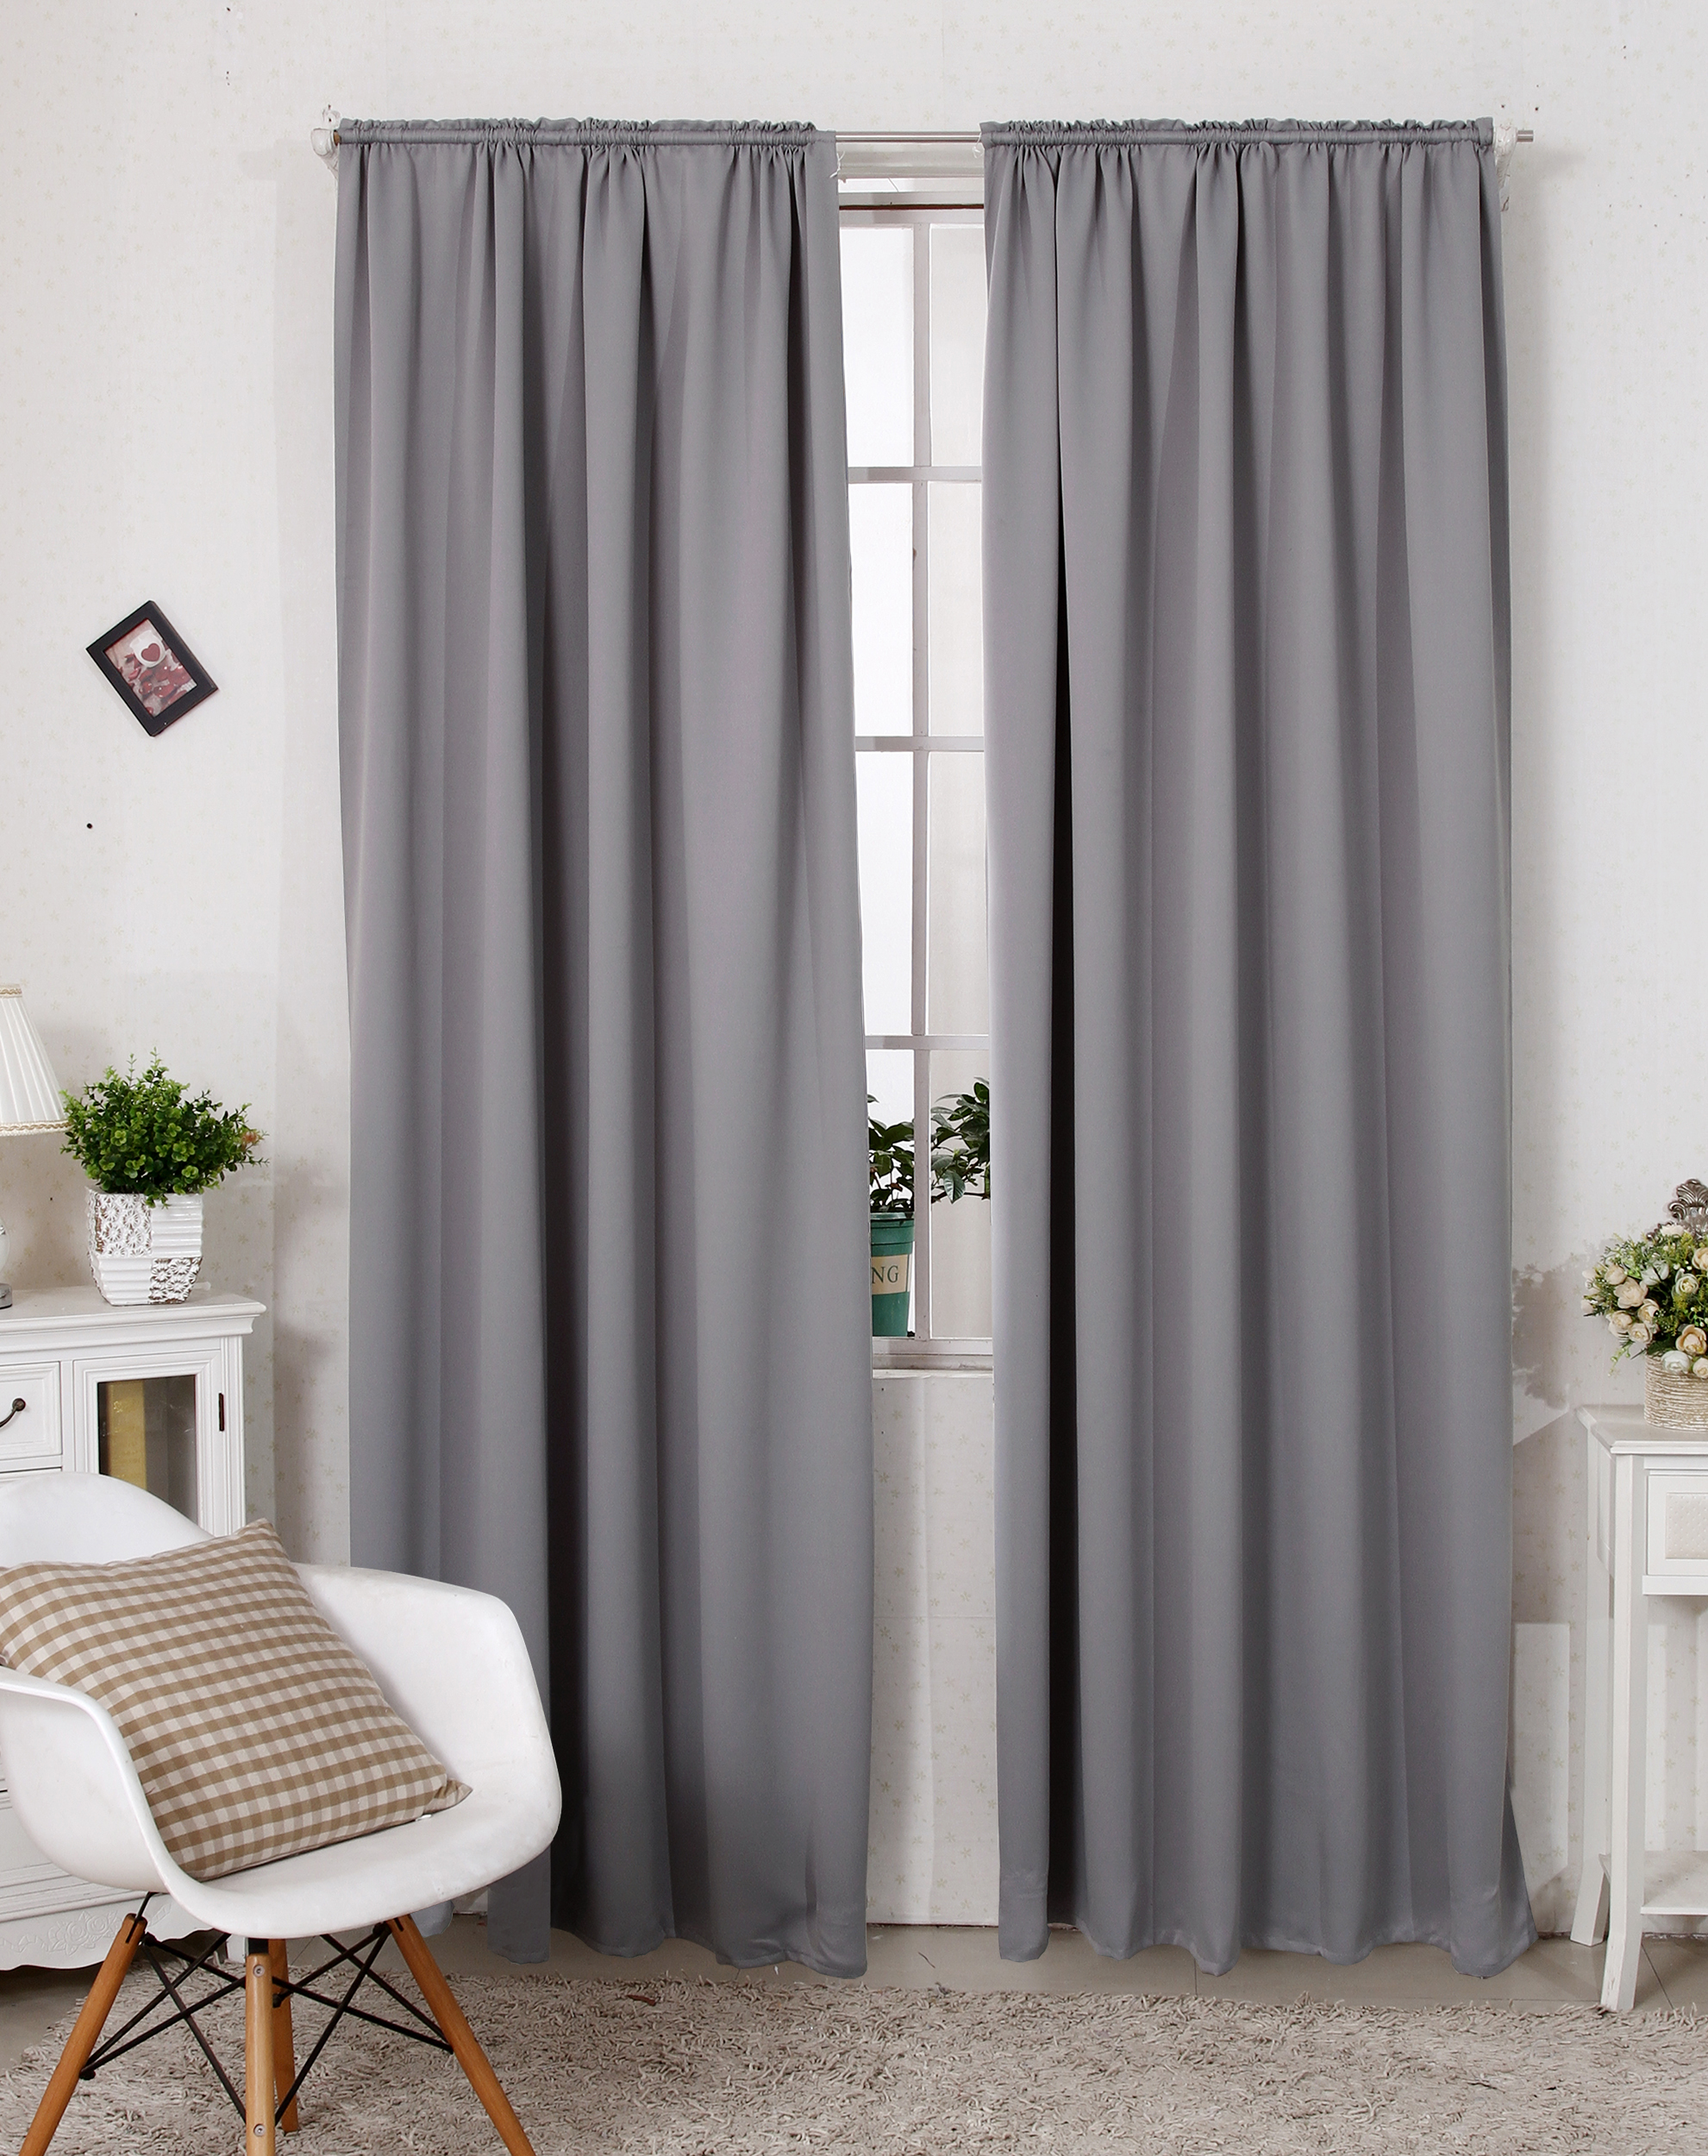 verdunklungsgardine thermogardine kr uselband blickdicht. Black Bedroom Furniture Sets. Home Design Ideas